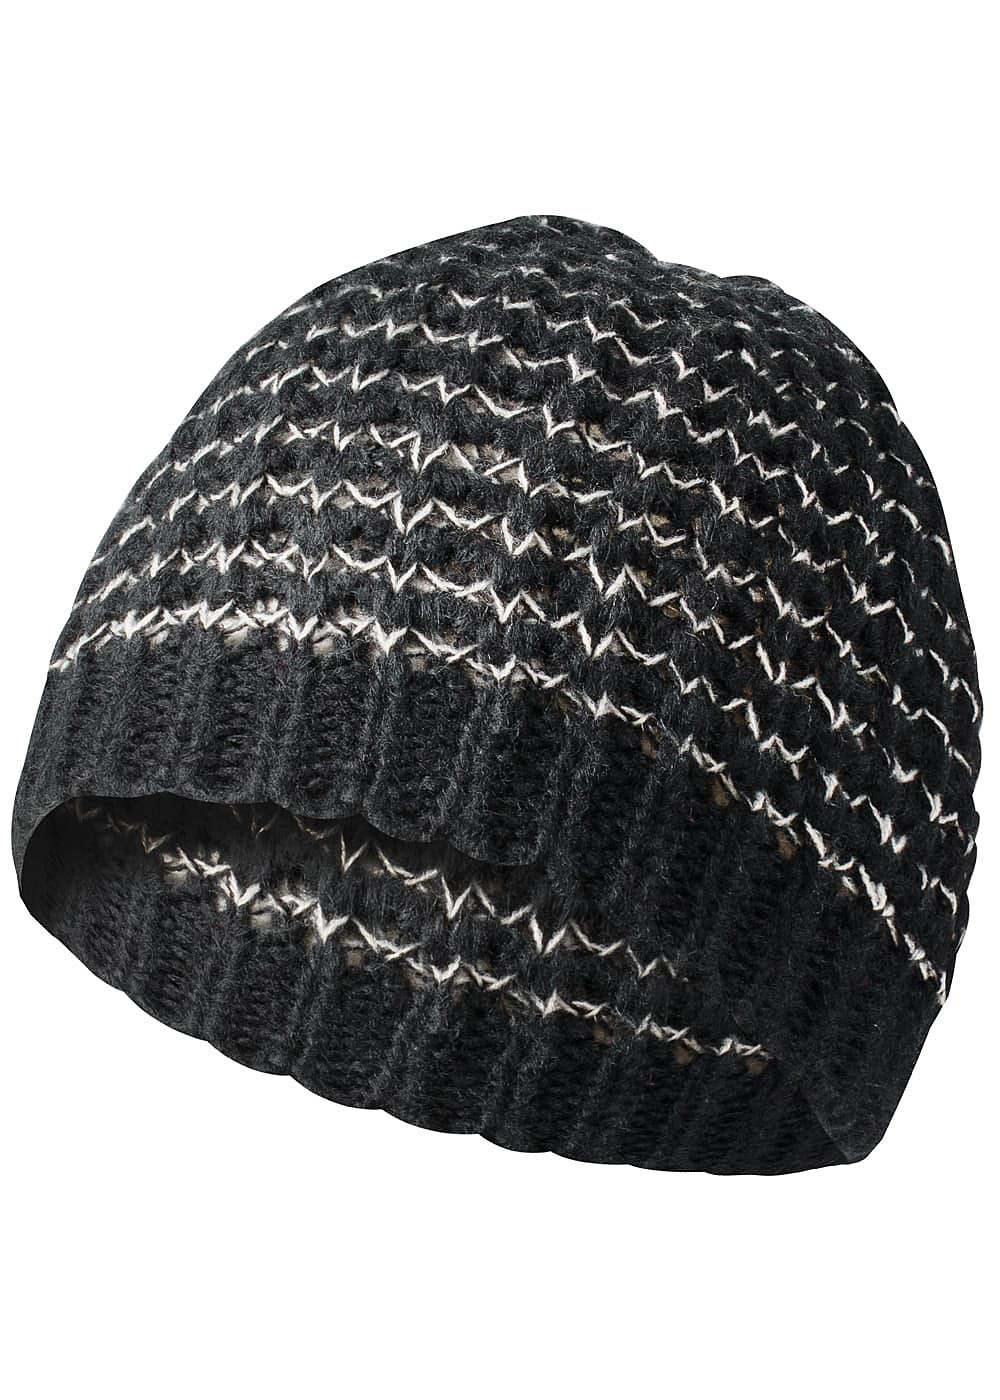 only damen winter strickm tze zickzack muster schwarz weiss 77onlineshop. Black Bedroom Furniture Sets. Home Design Ideas